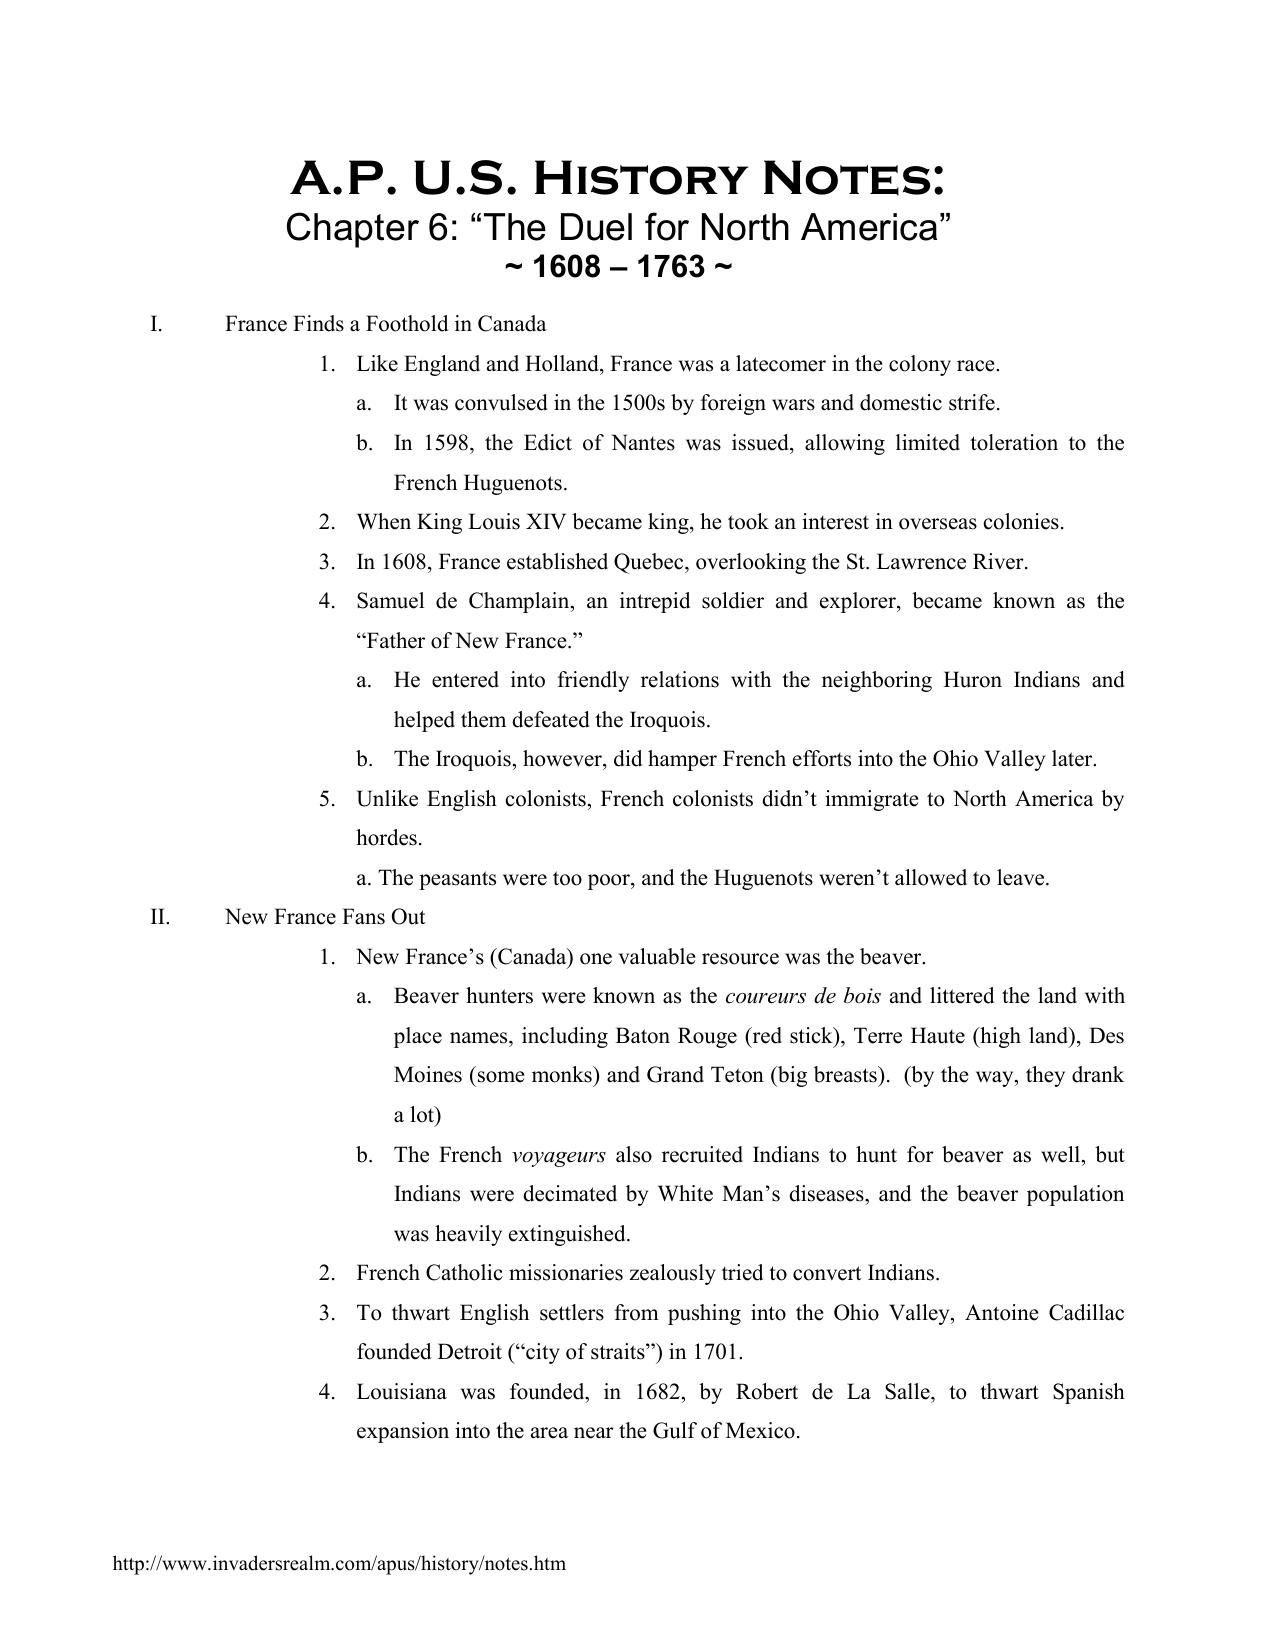 chapter 6 notes rh studyres com